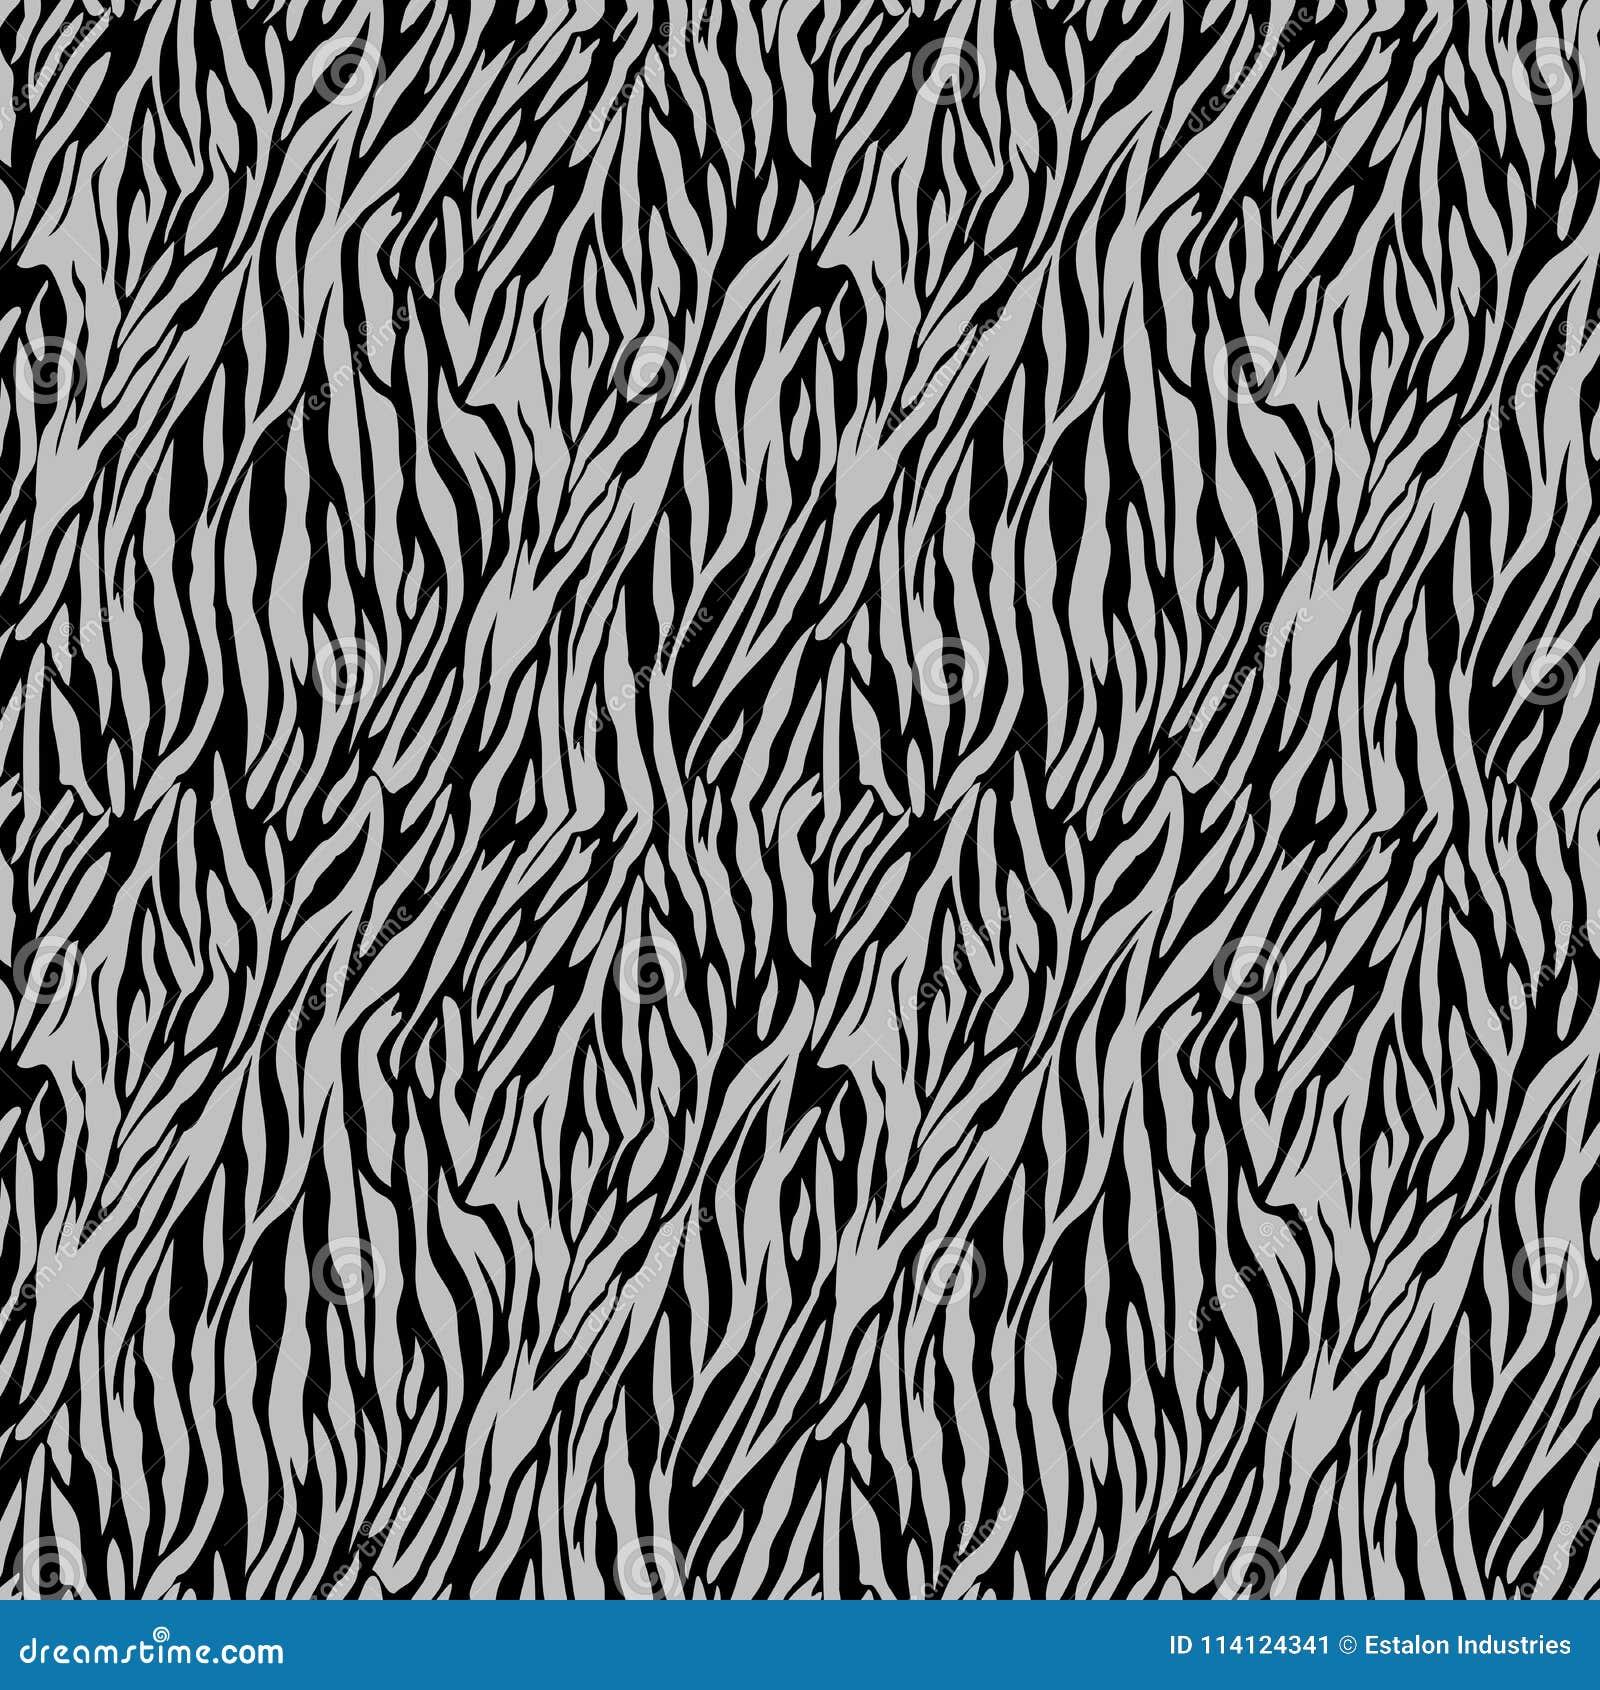 Silver on black zebra stripe print seamless repeat pattern background